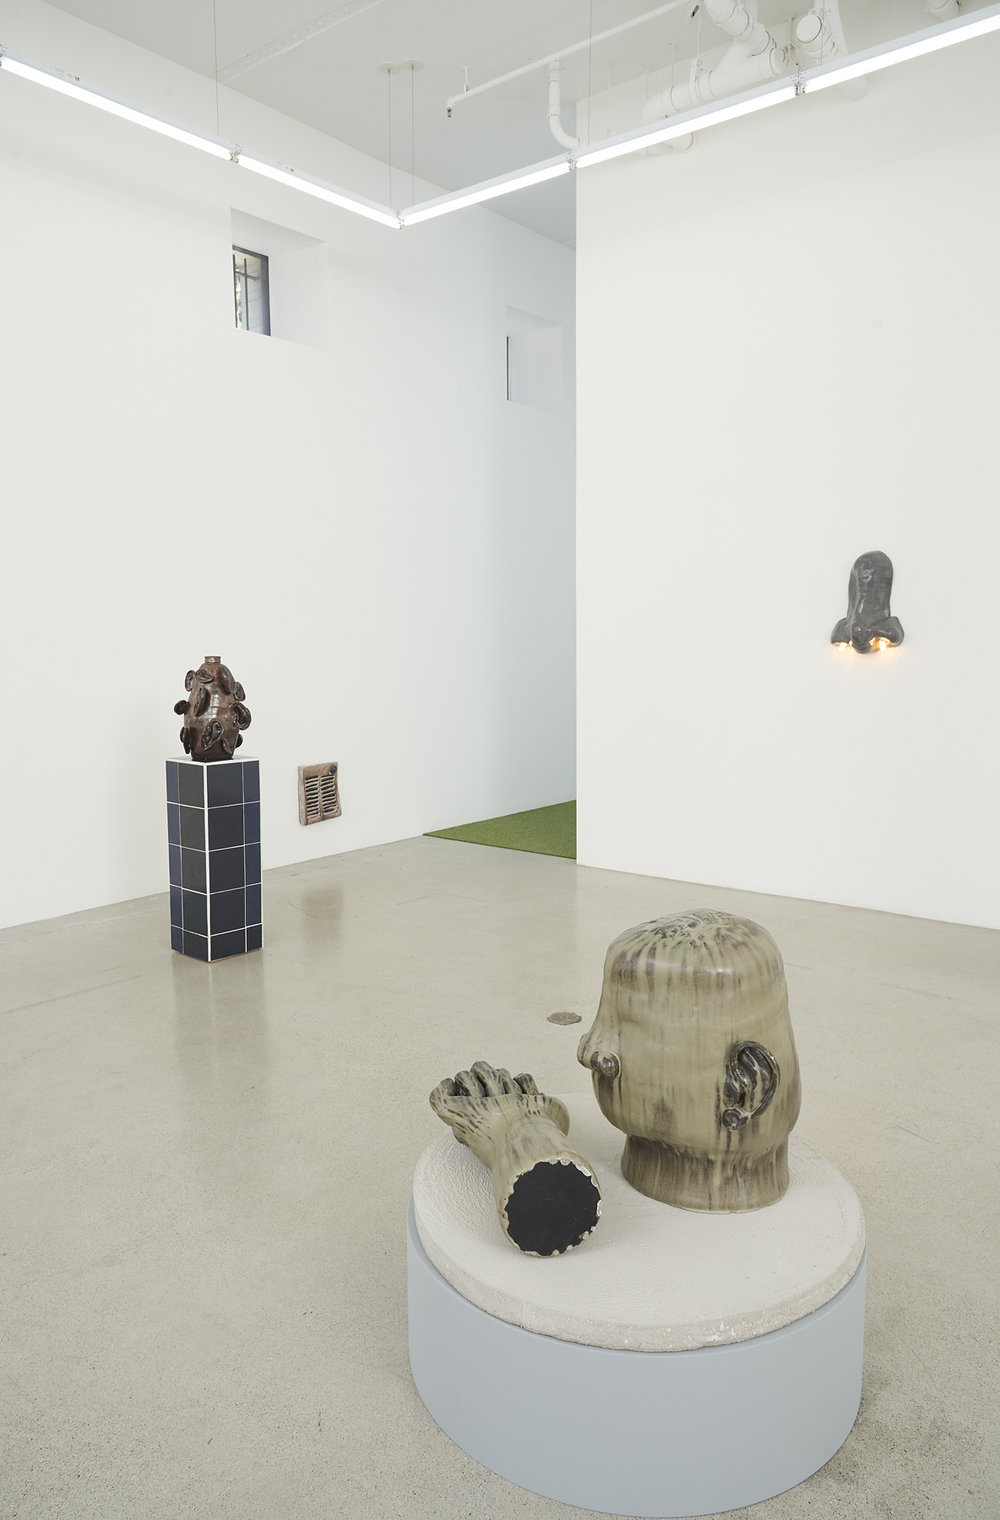 Othello_Living Room, 2018_Jessica Silverman Gallery_Installation view 09.PRS.jpg